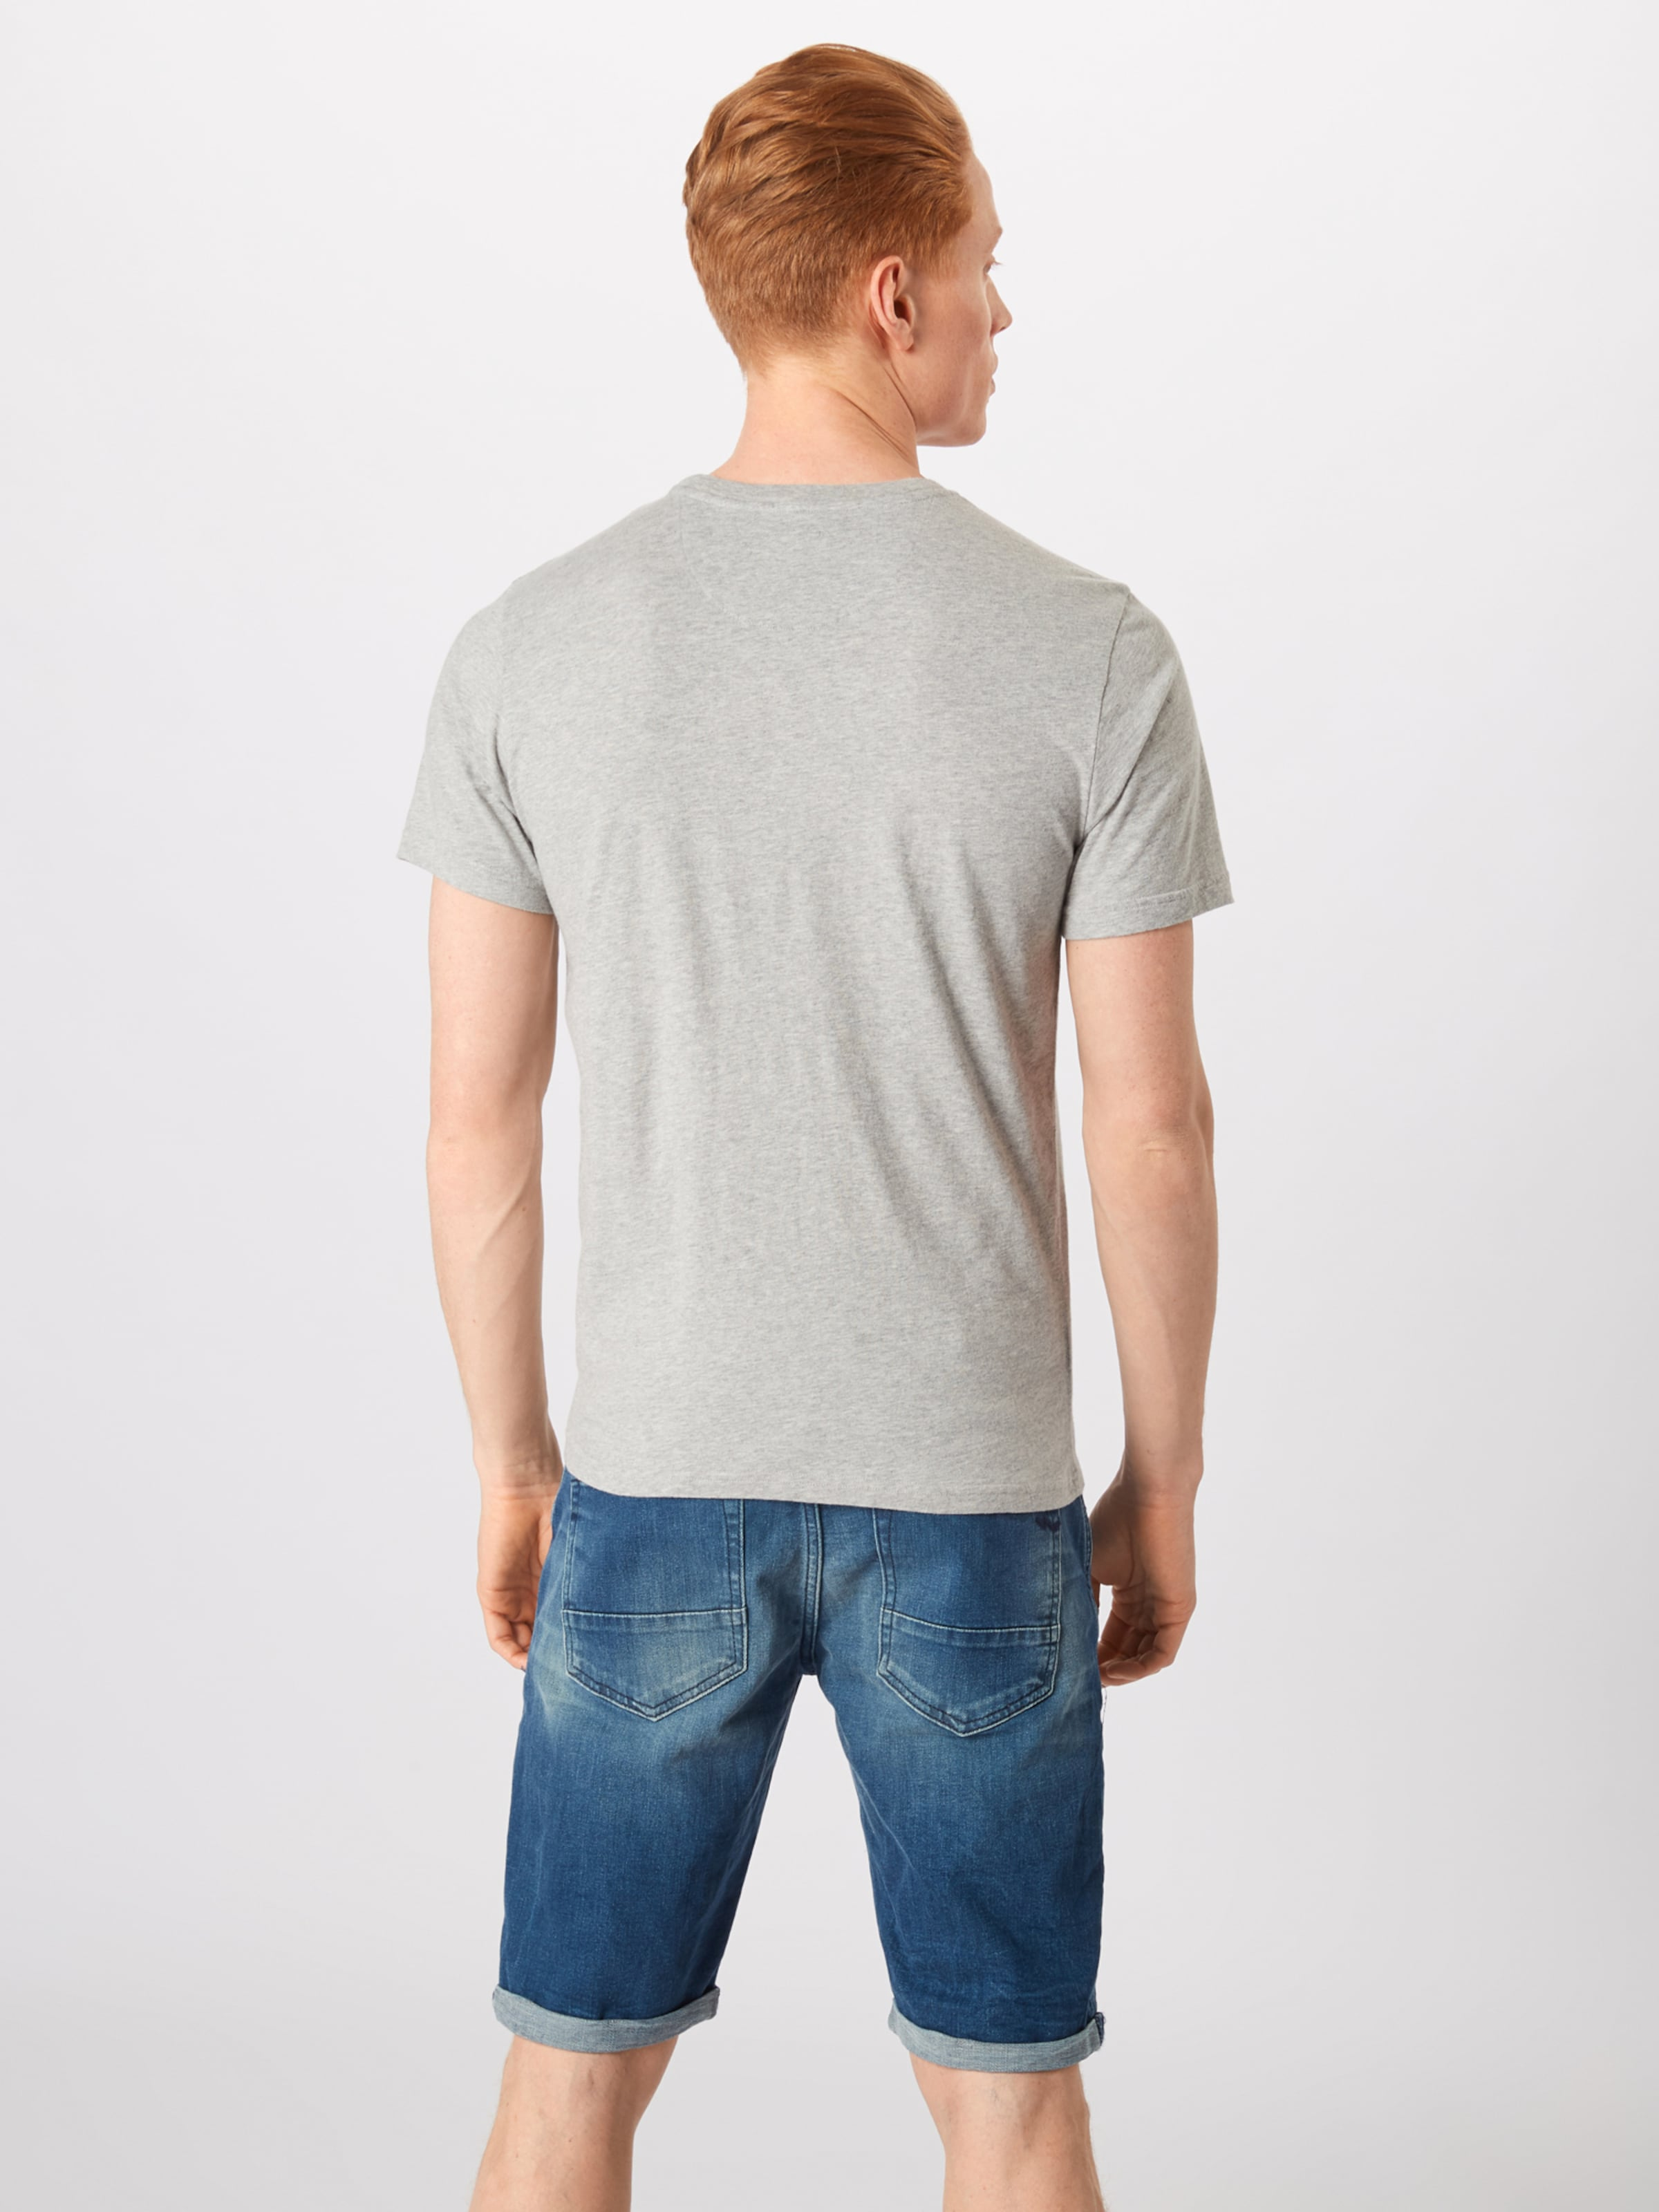 Shirt In Grau North North Sails 1uFlKc3TJ